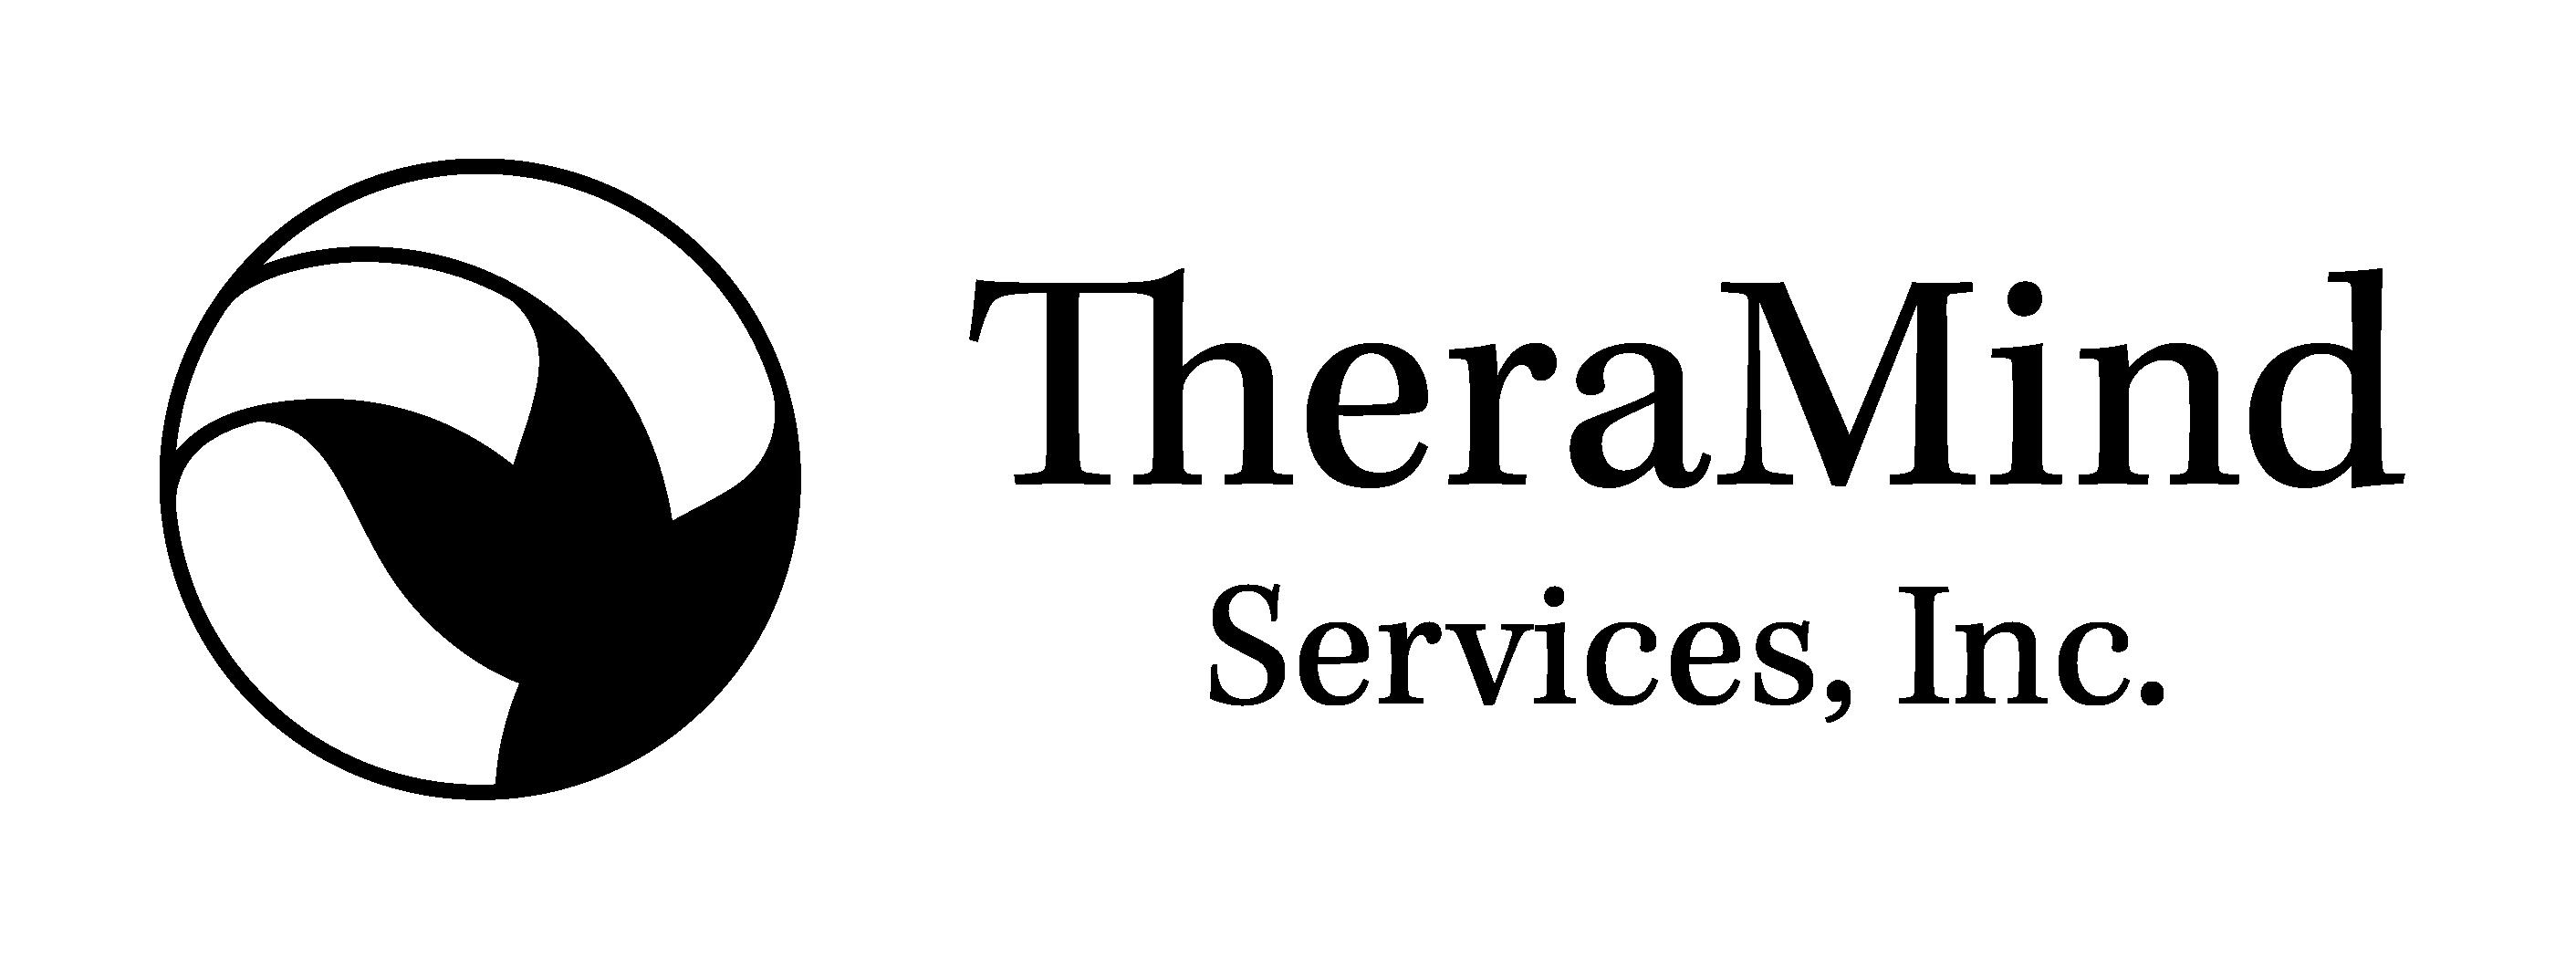 TheraMind Services, Inc